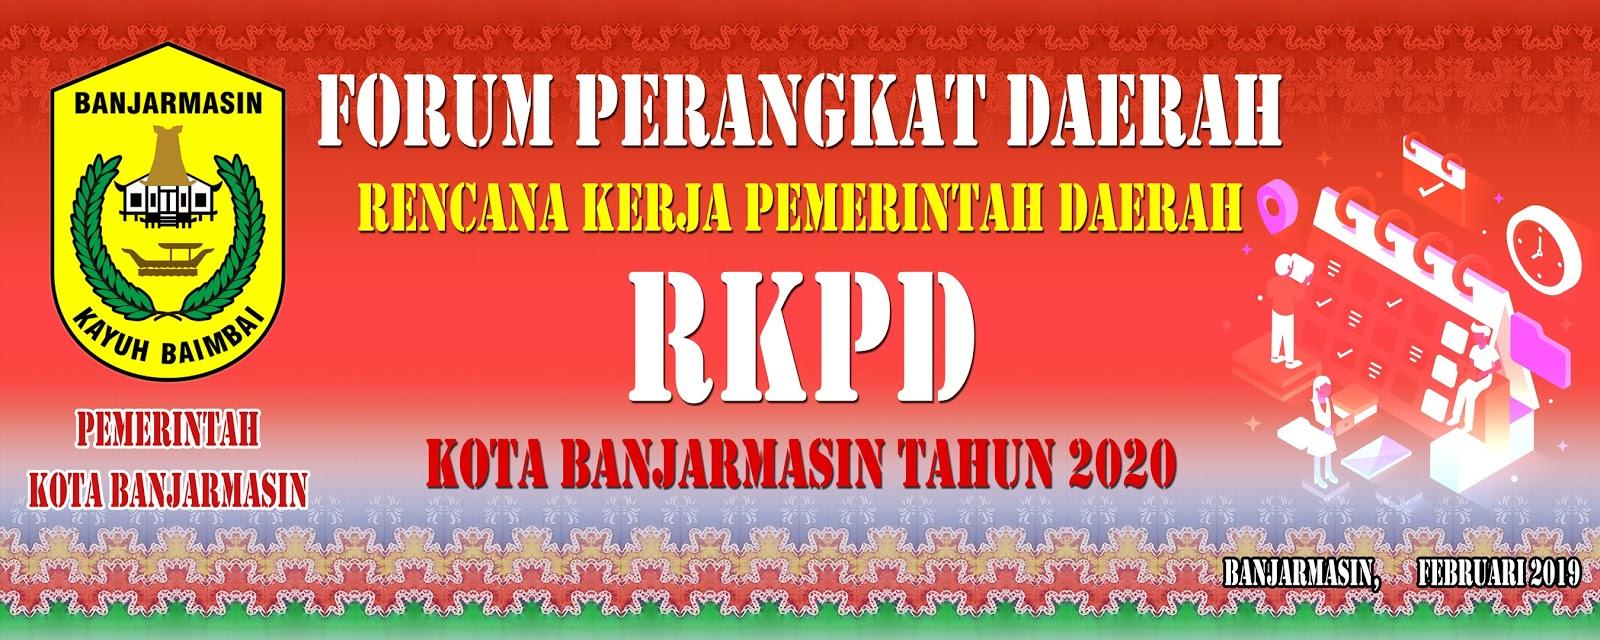 Spanduk_FPD_RKPD2020